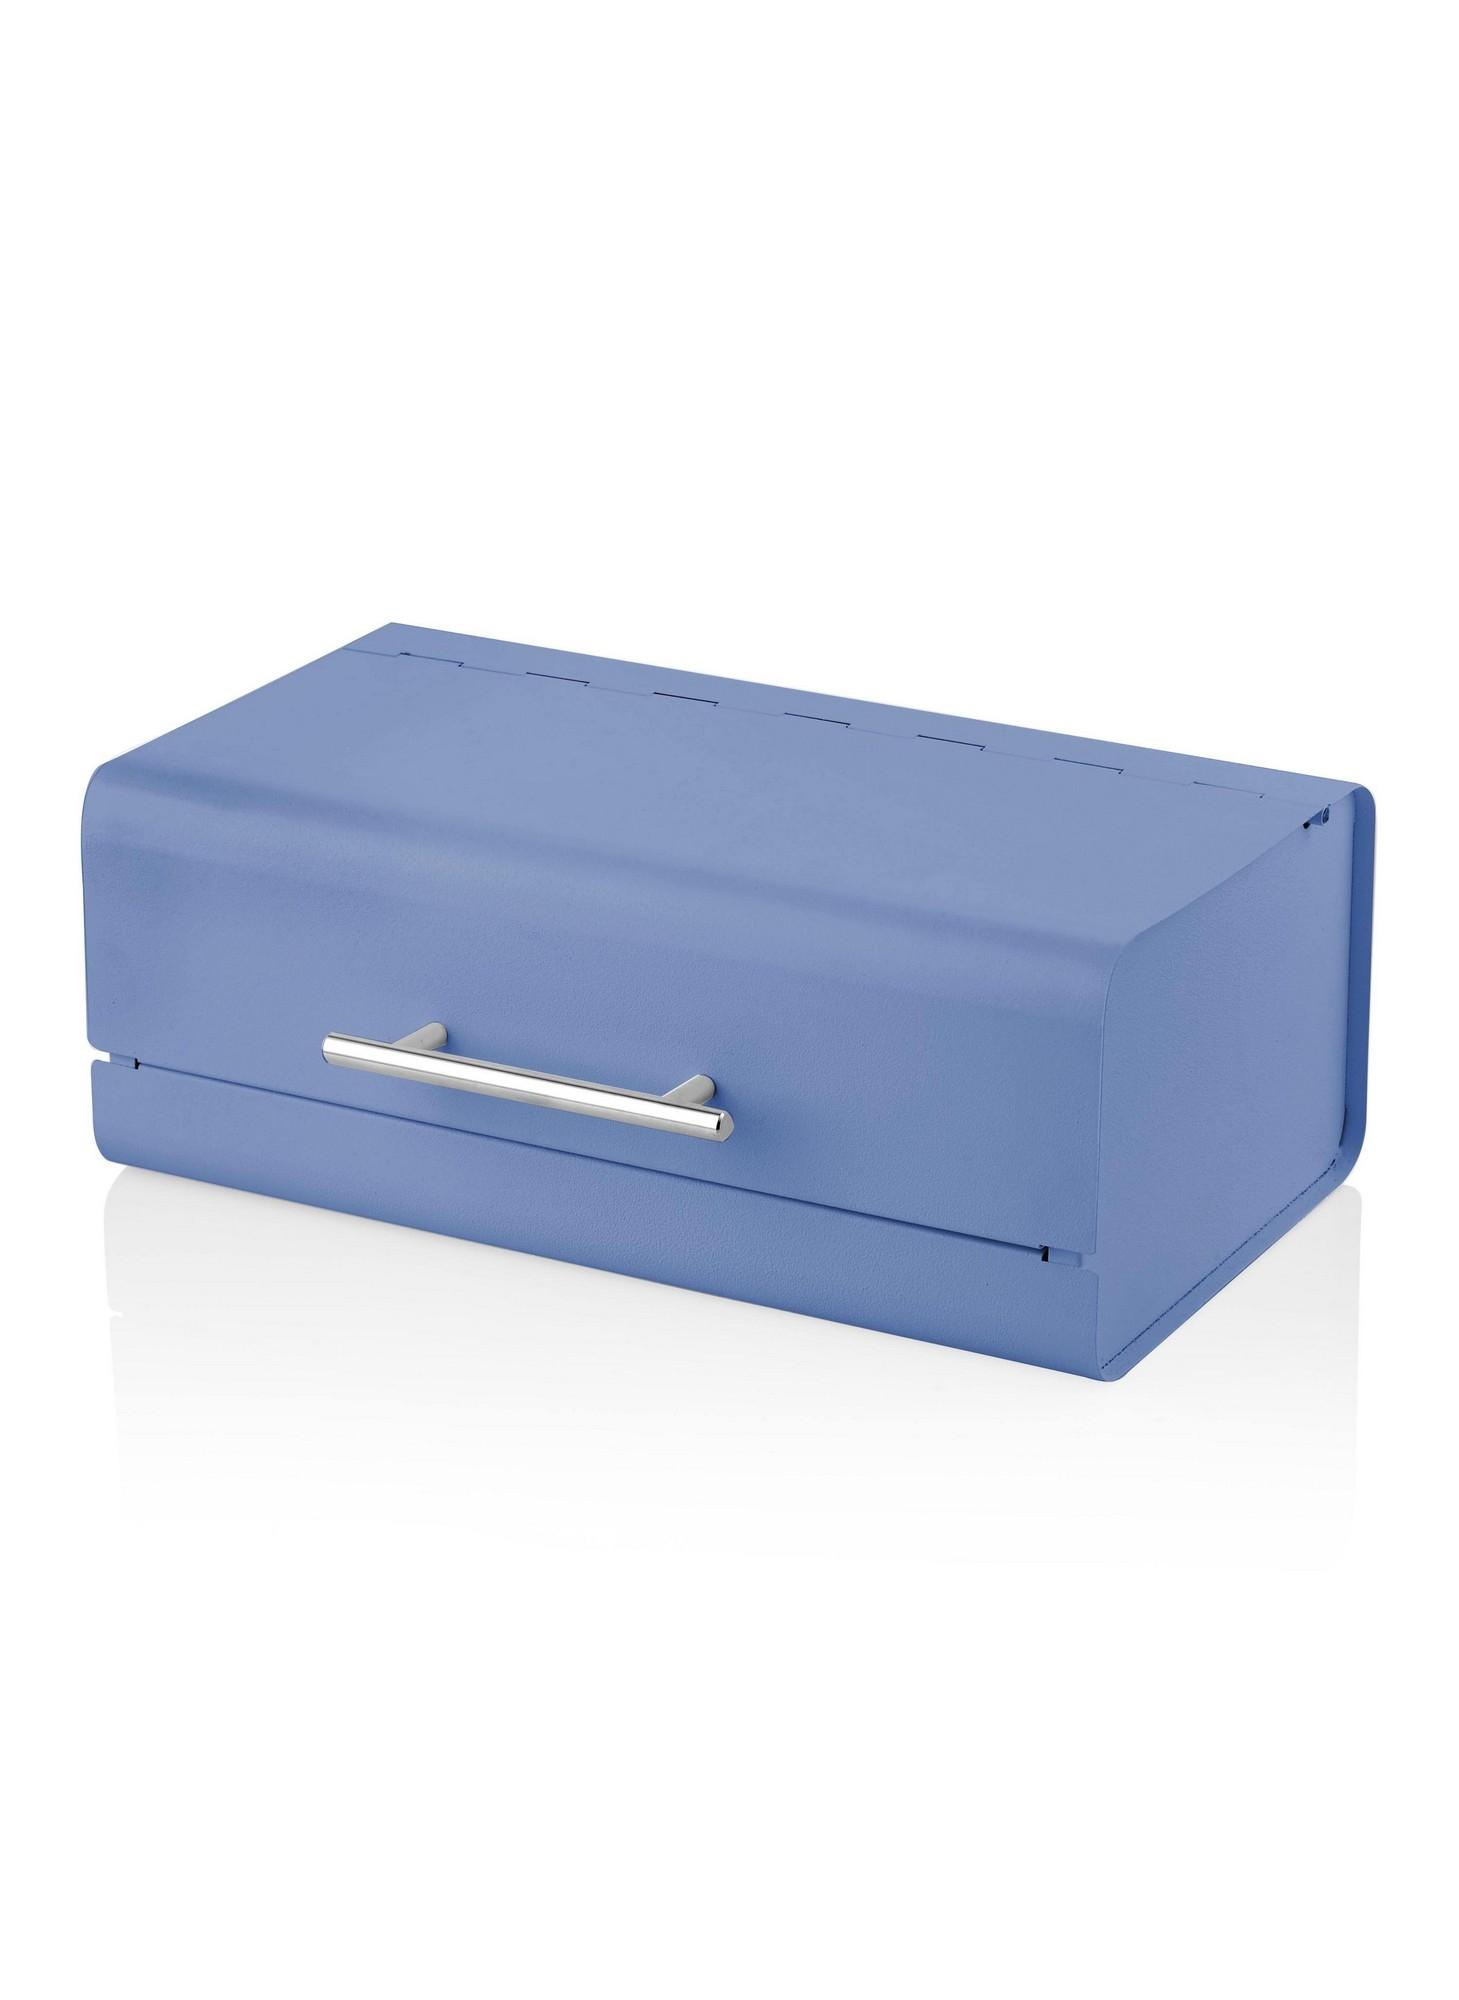 Cutie pentru paine, din metal, Glove Bleu, l36xA21xH13 cm imagine